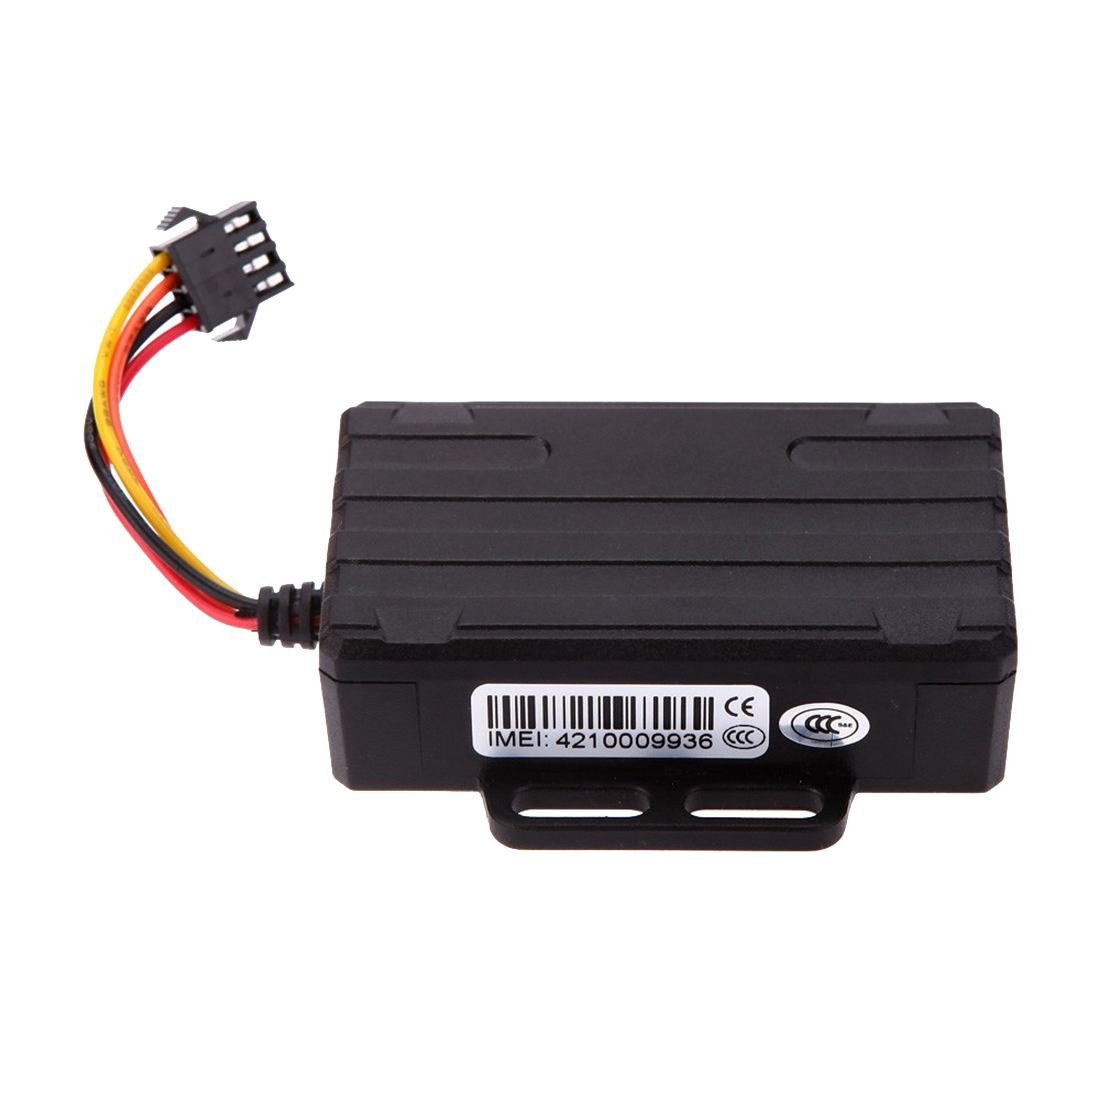 Toogoo Vehicle Car GPS SMS GPRS Tracker Real Time Tracking Device Alarm Waterproof New